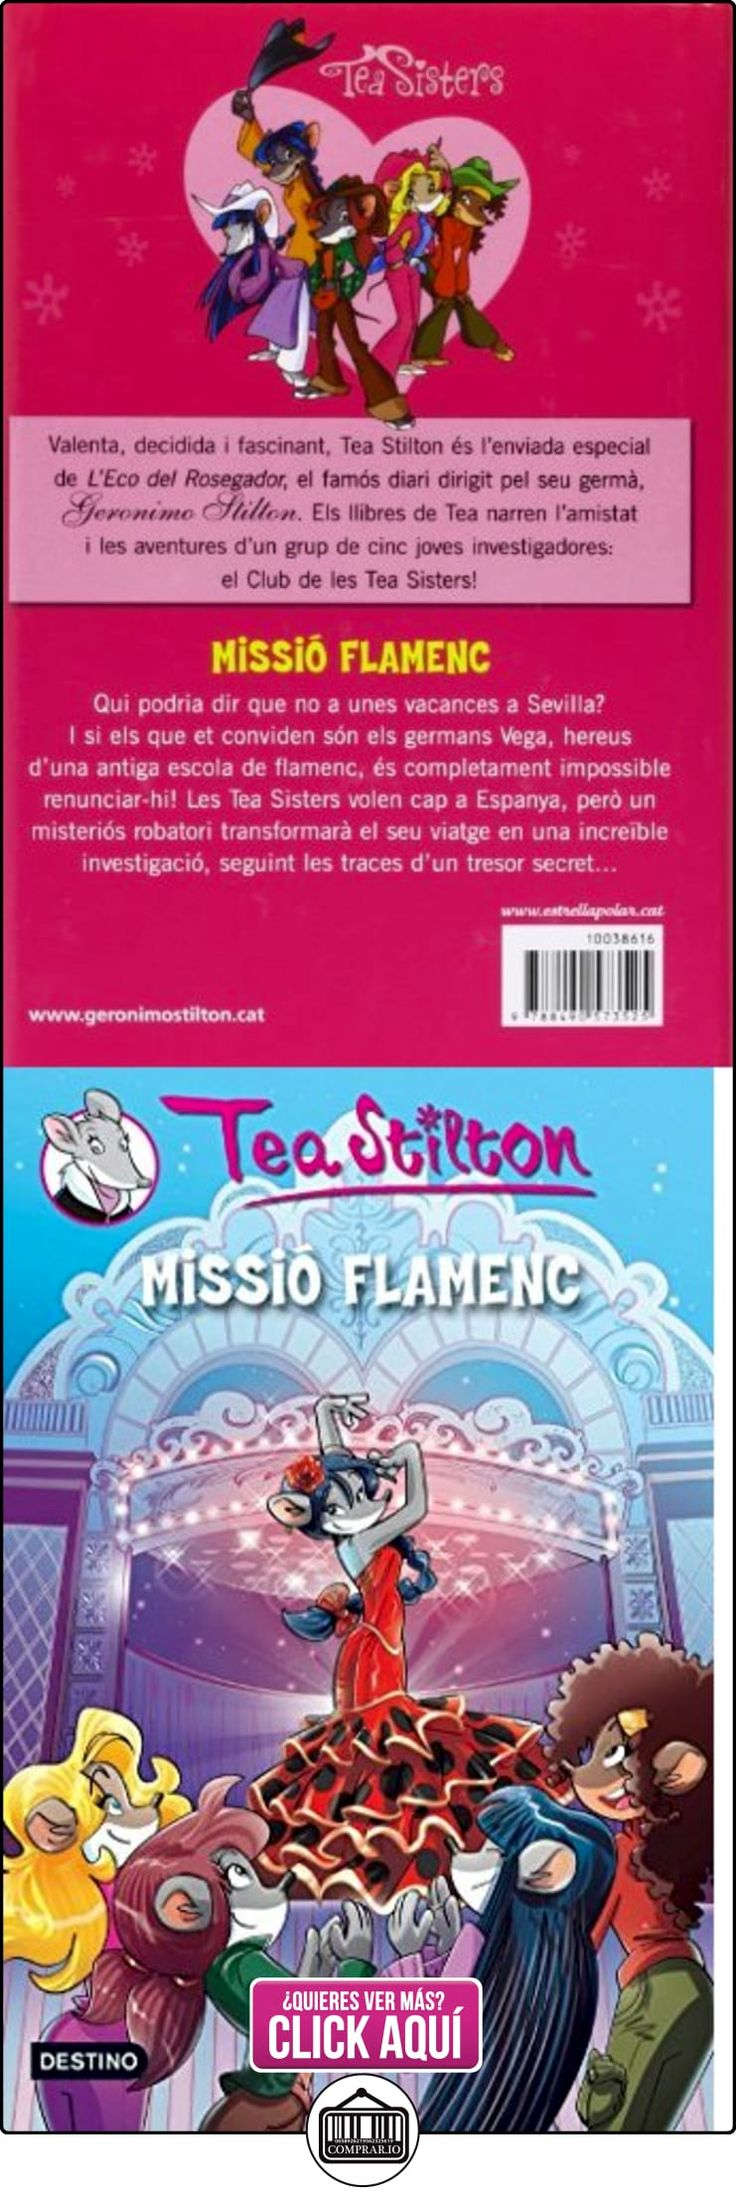 Missió Flamenc (Tea Stilton) Tea Stilton ✿ Peppa Pig - Peppa La Cerdita ✿ ▬► Ver oferta: http://comprar.io/goto/8490573522